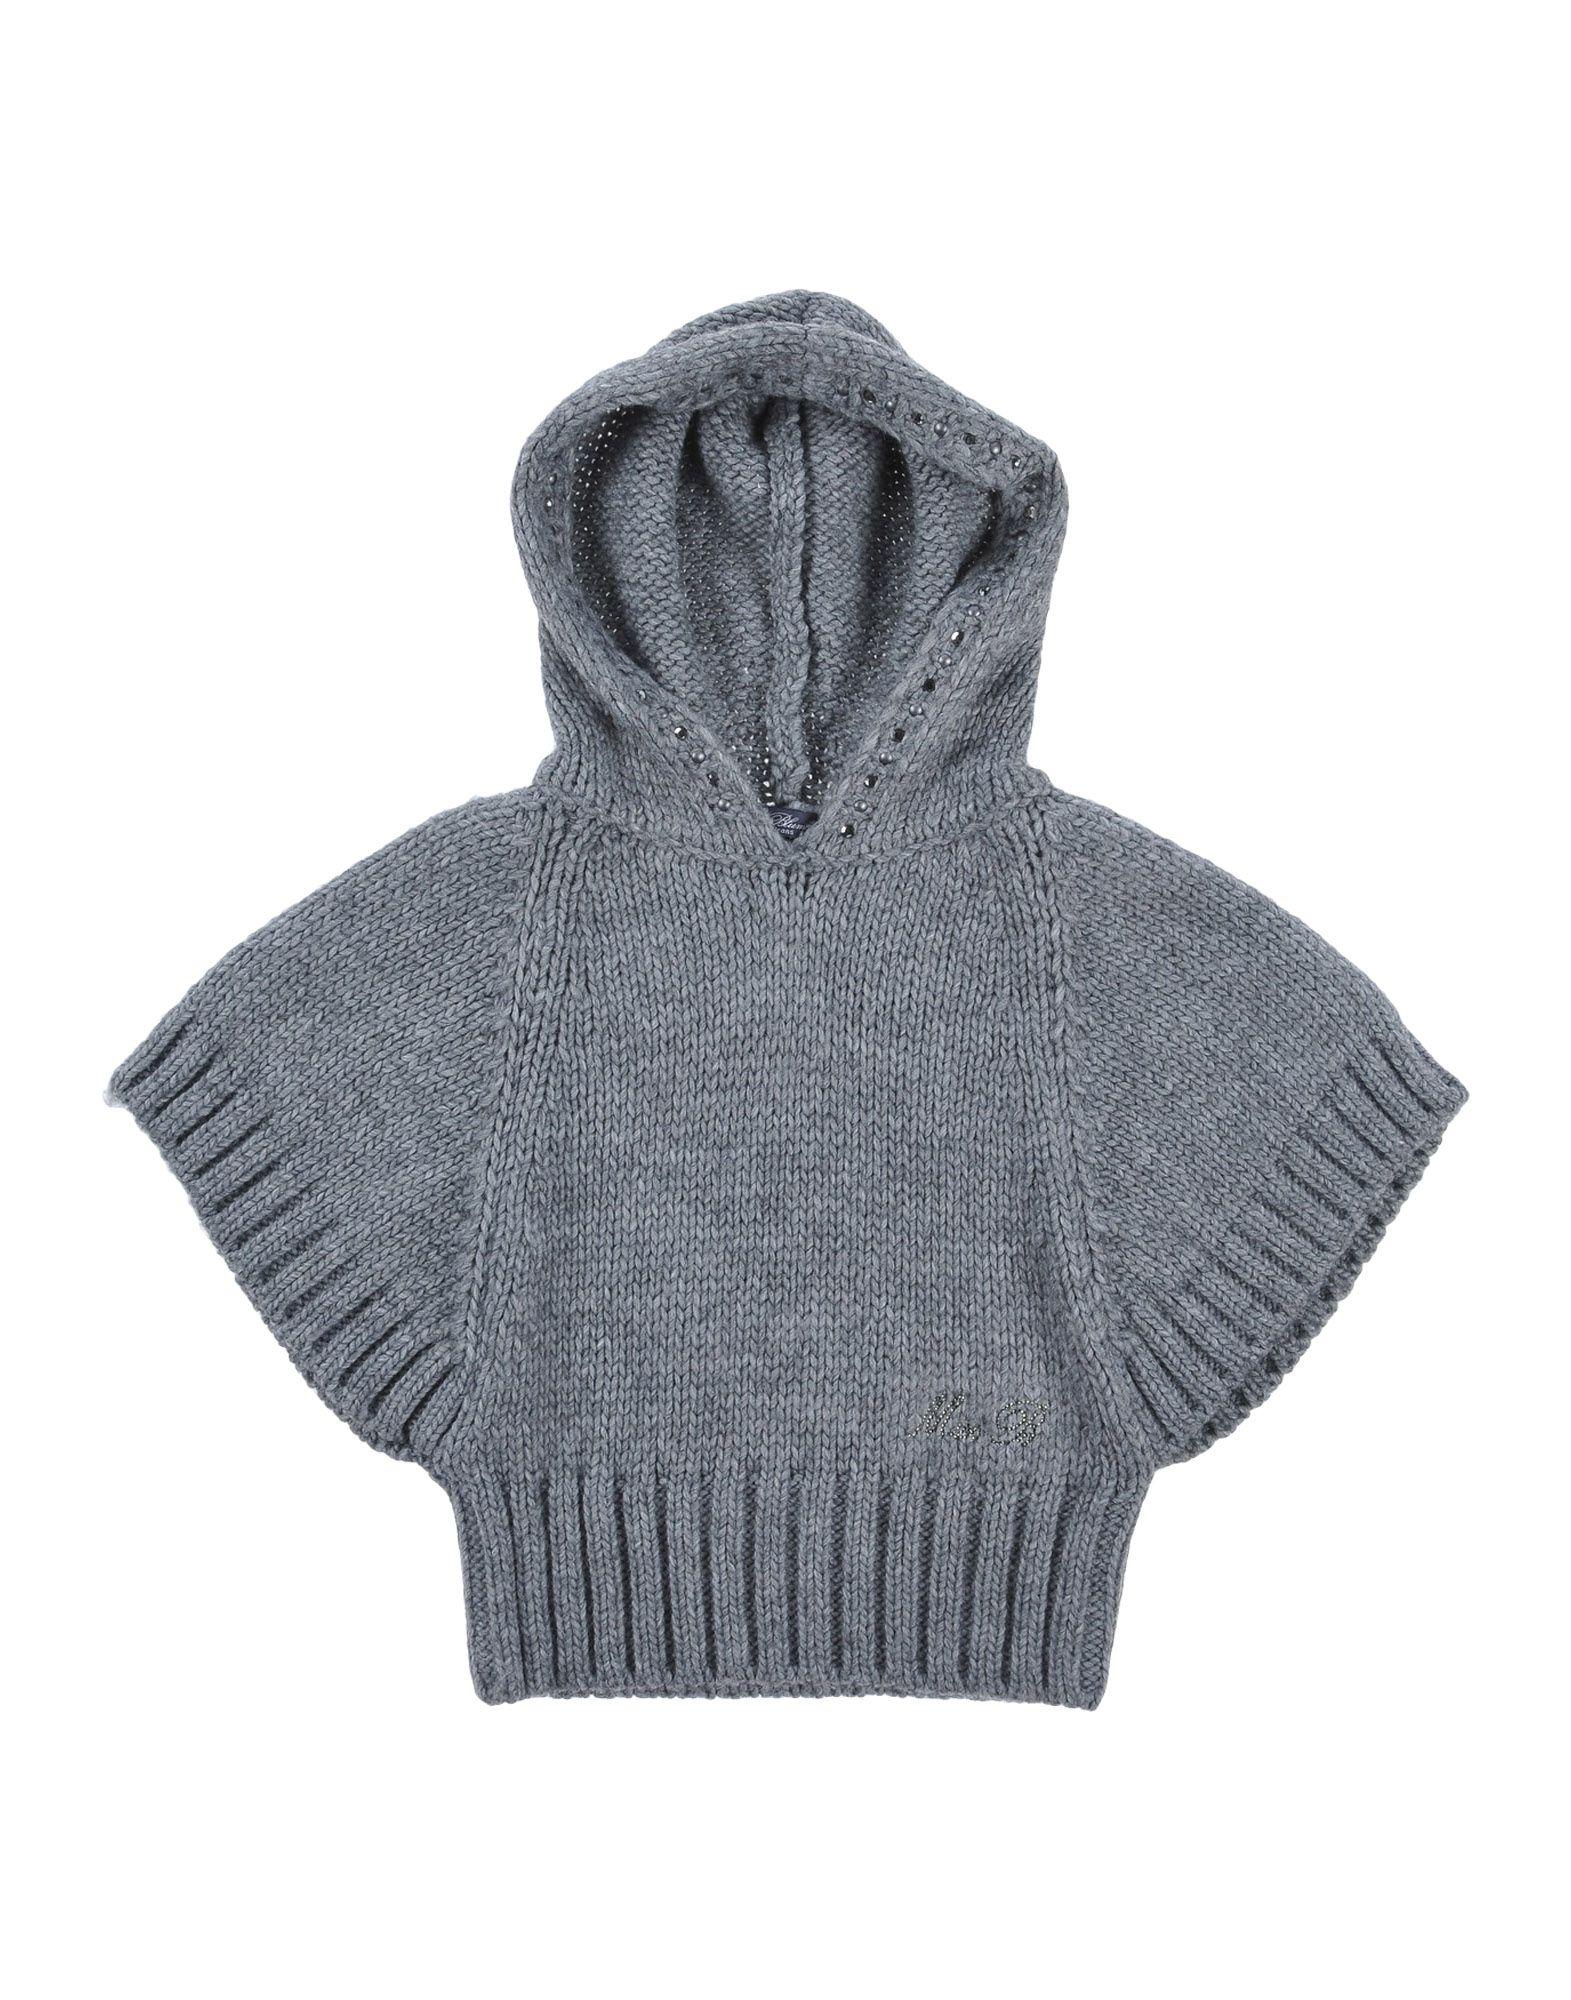 MISS BLUMARINE Sweater in Grey